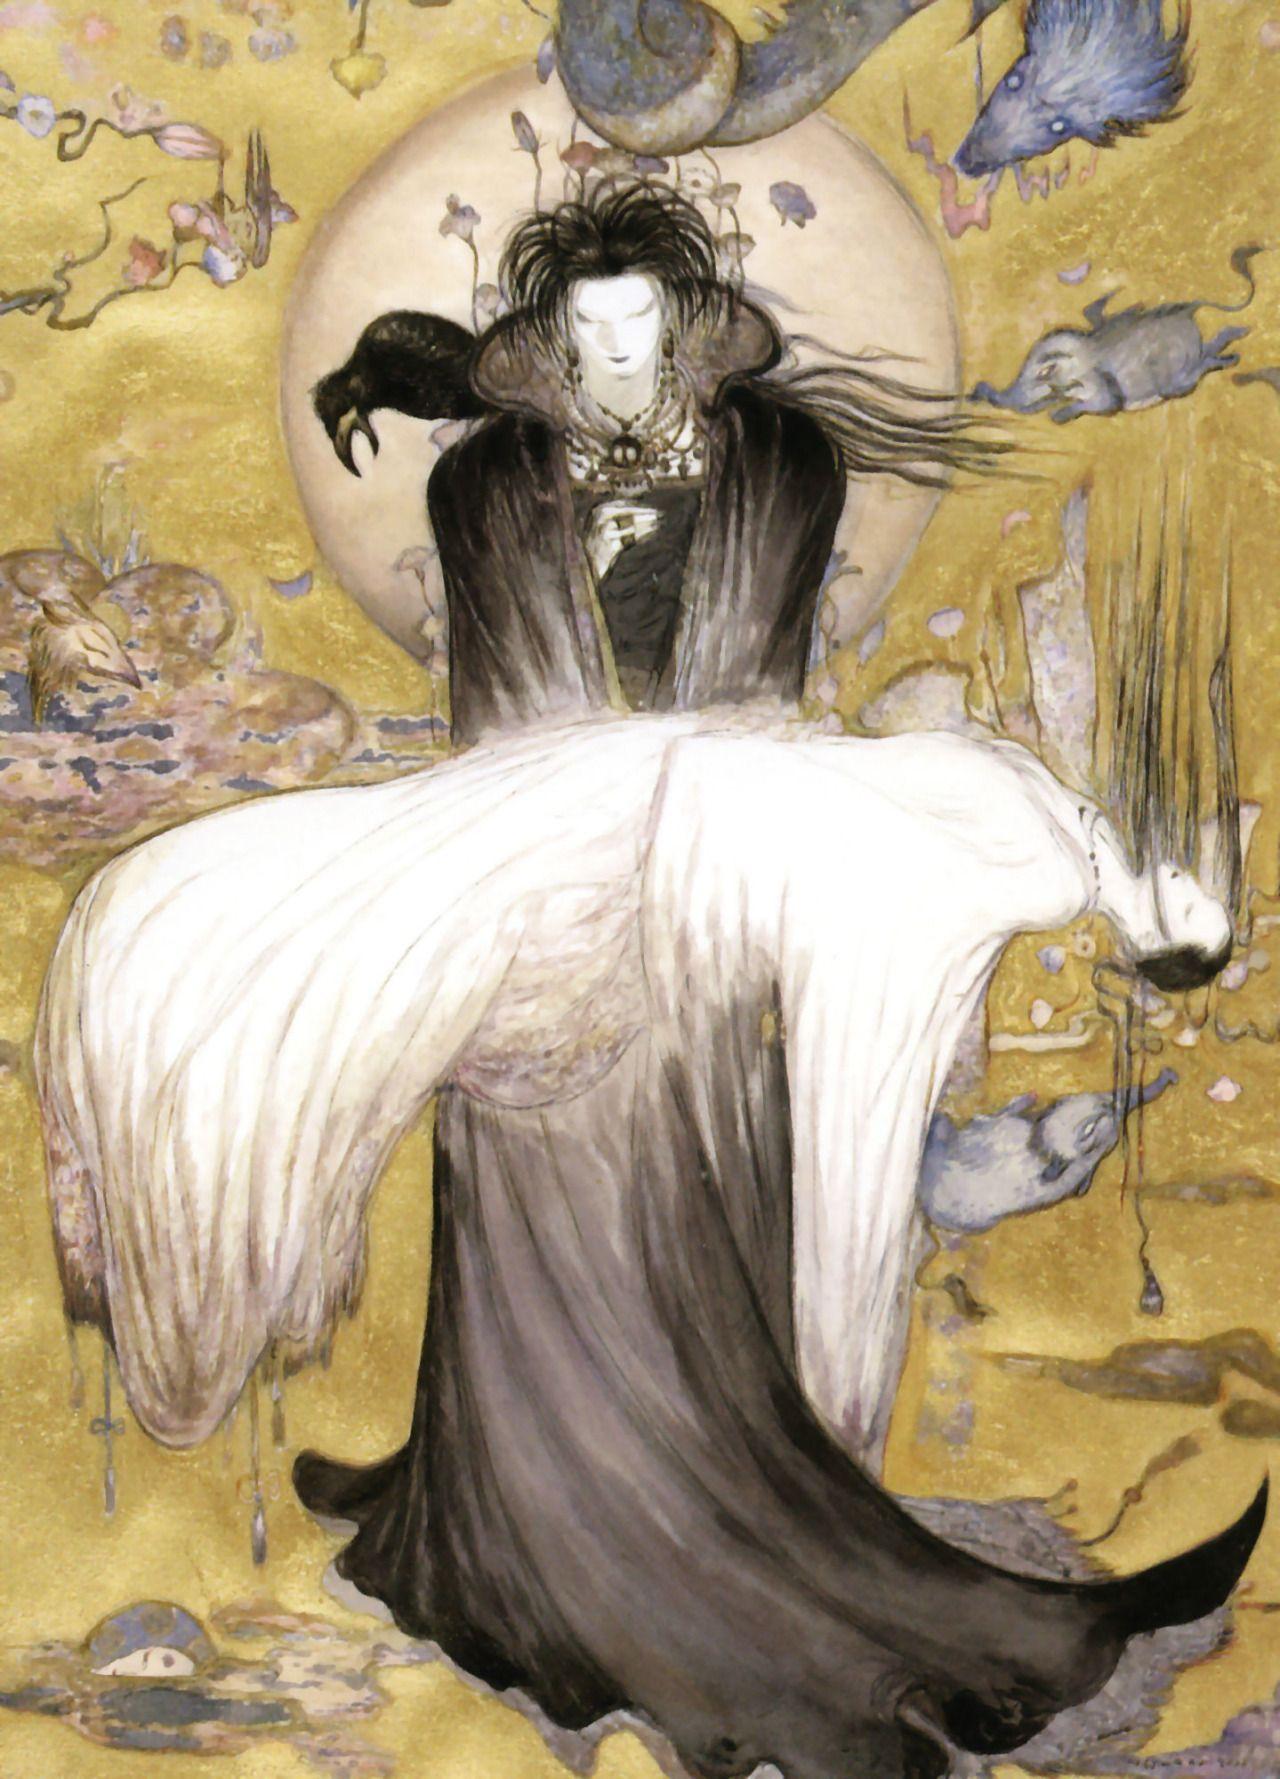 Queen of All Shadows